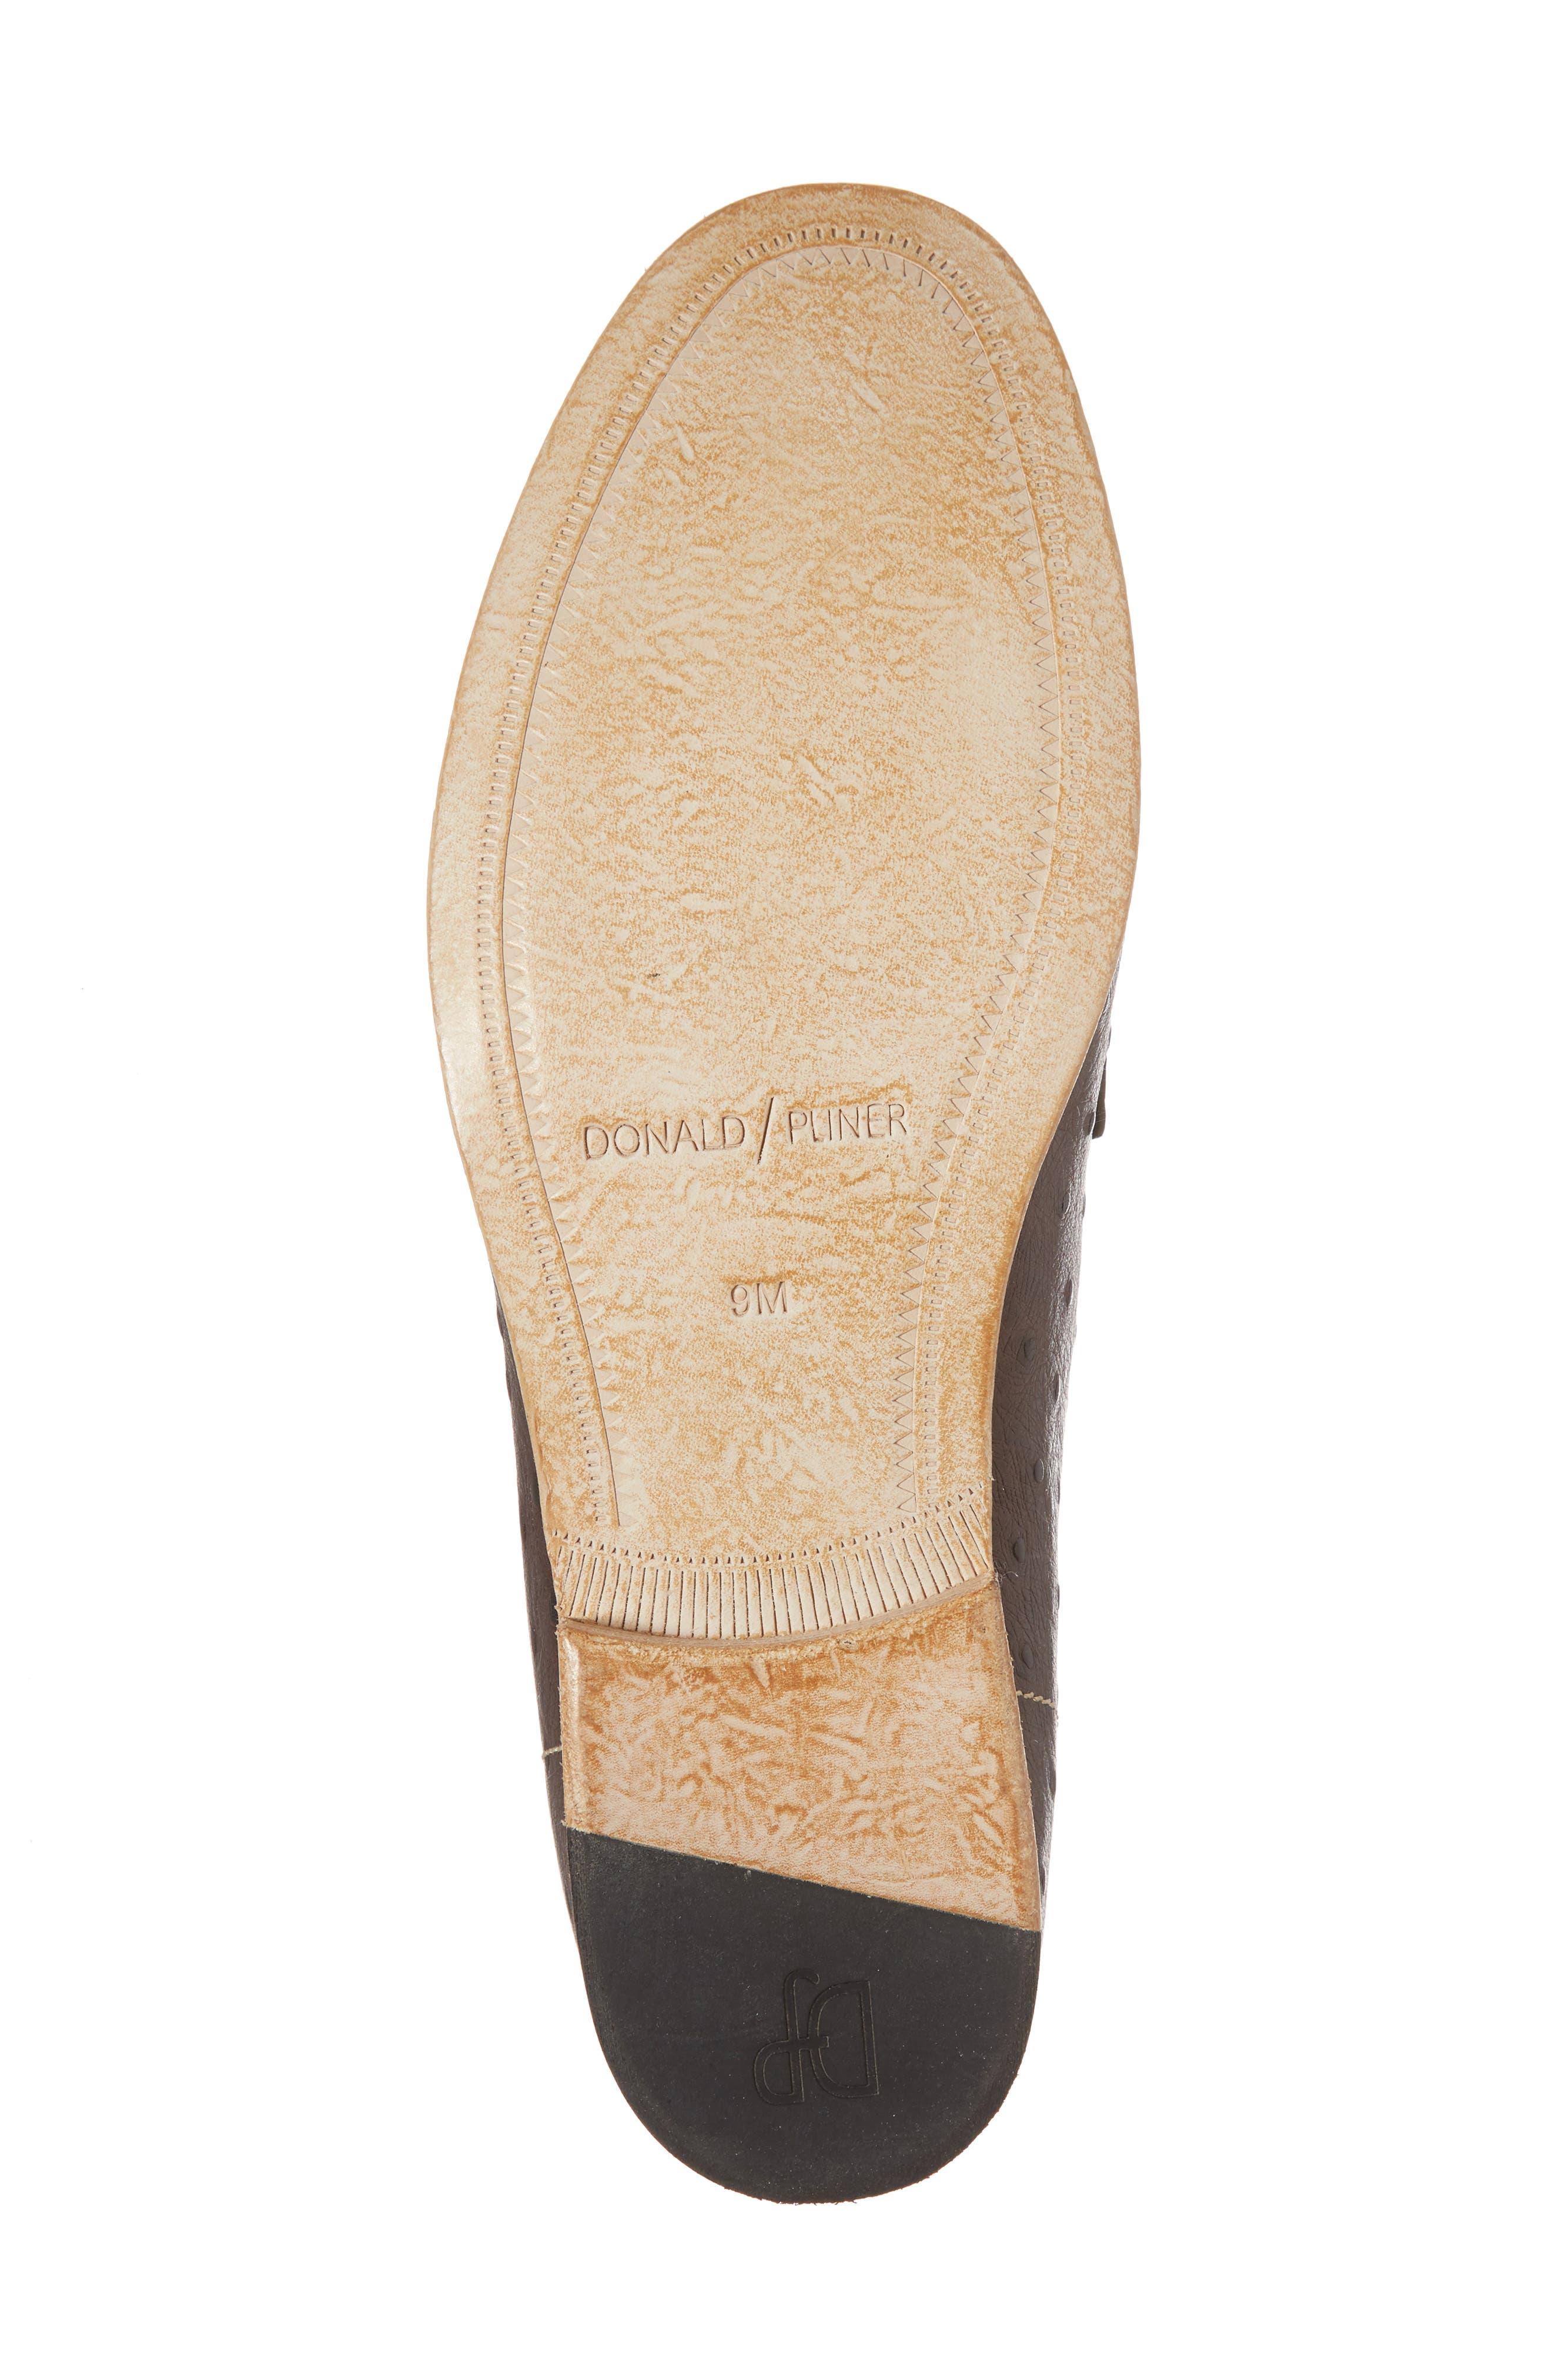 Moritz Apron Toe Bit Loafer,                             Alternate thumbnail 6, color,                             Brown Leather